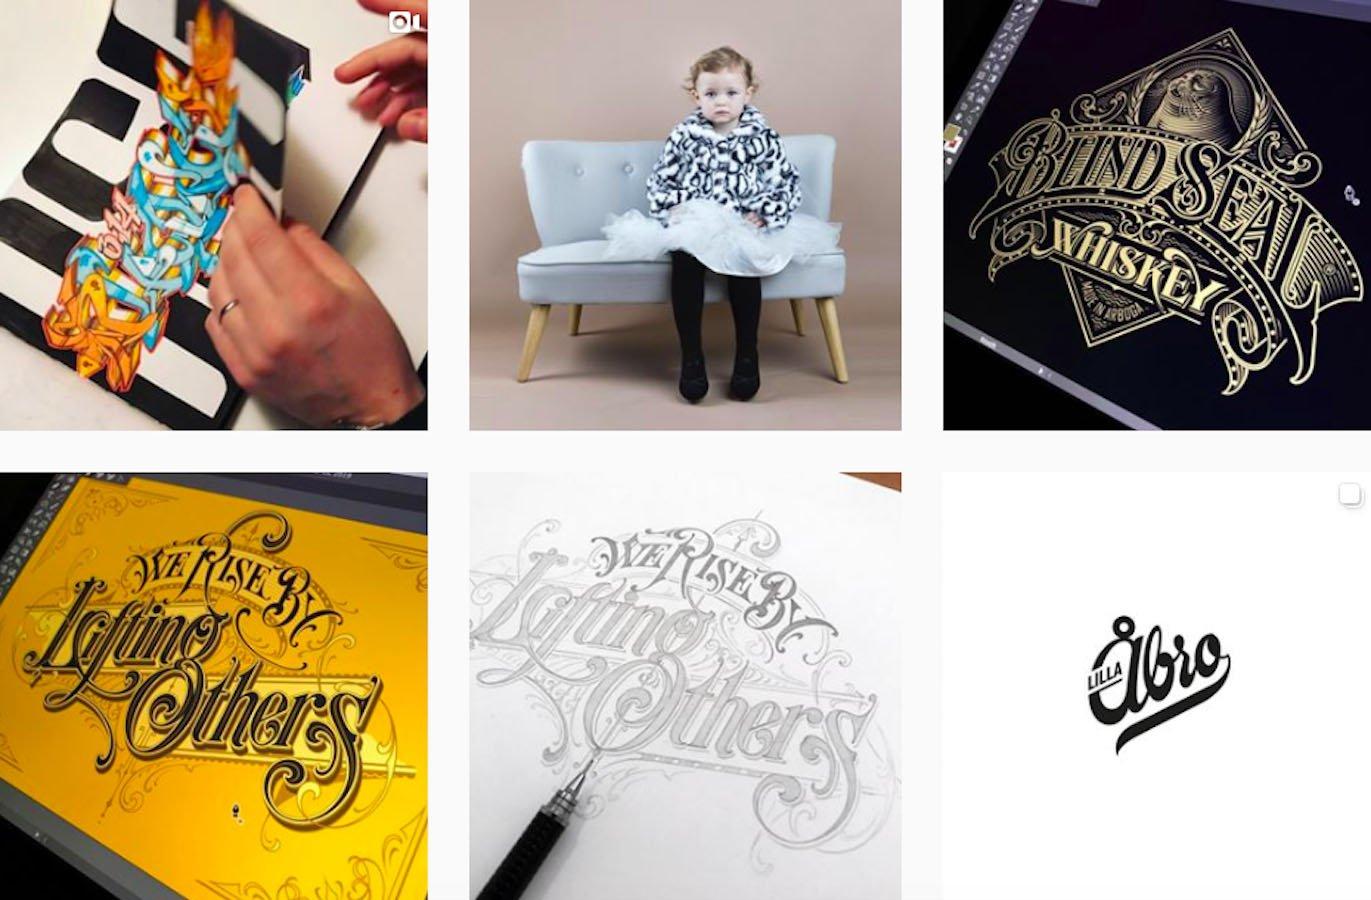 Web Design Inspiration: 110+ Accounts On Instagram and 10+ Best UX & Web Design Books in 2020 - schmetzer